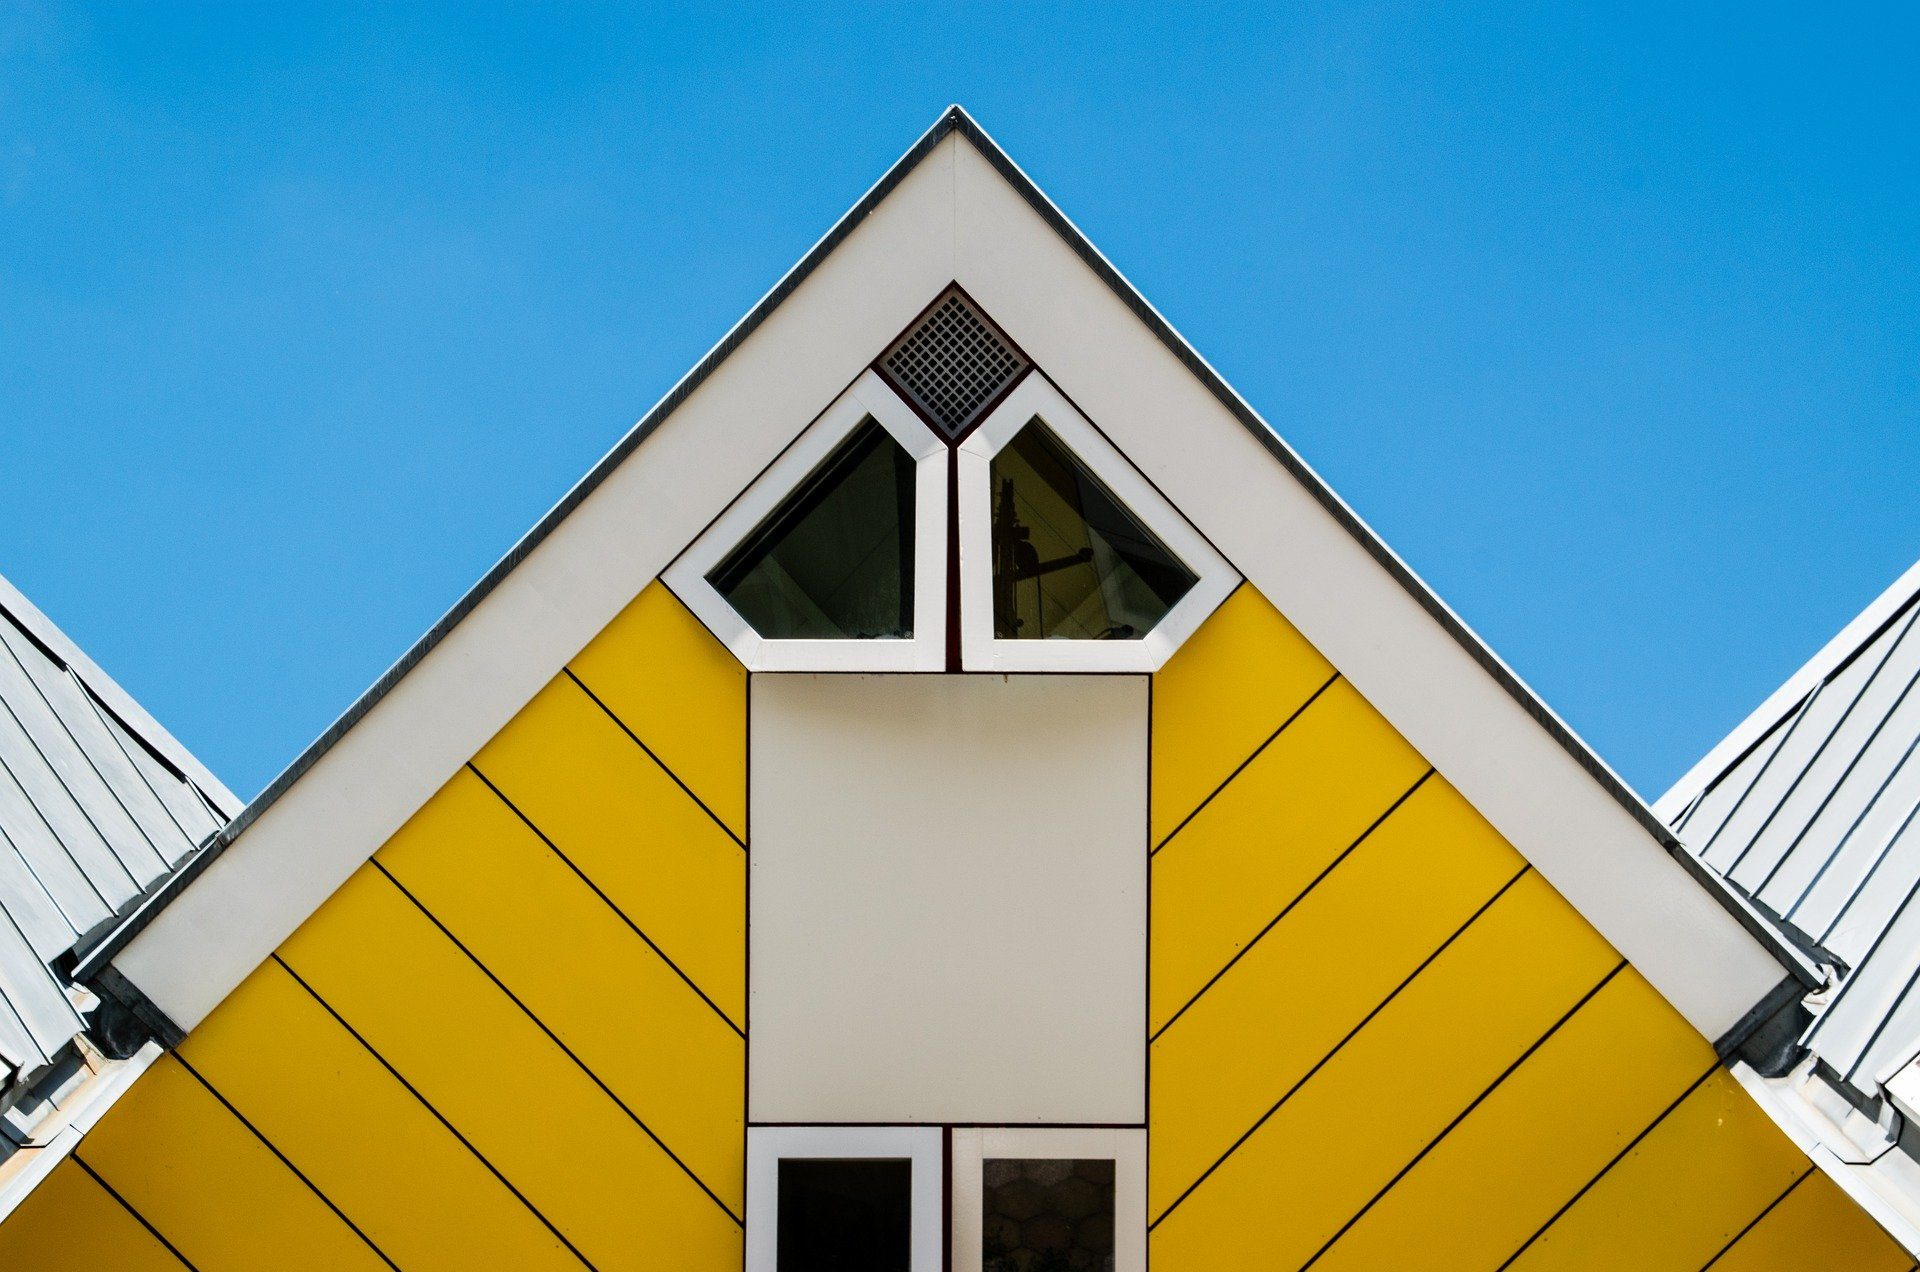 cubic-house-6566412_1920